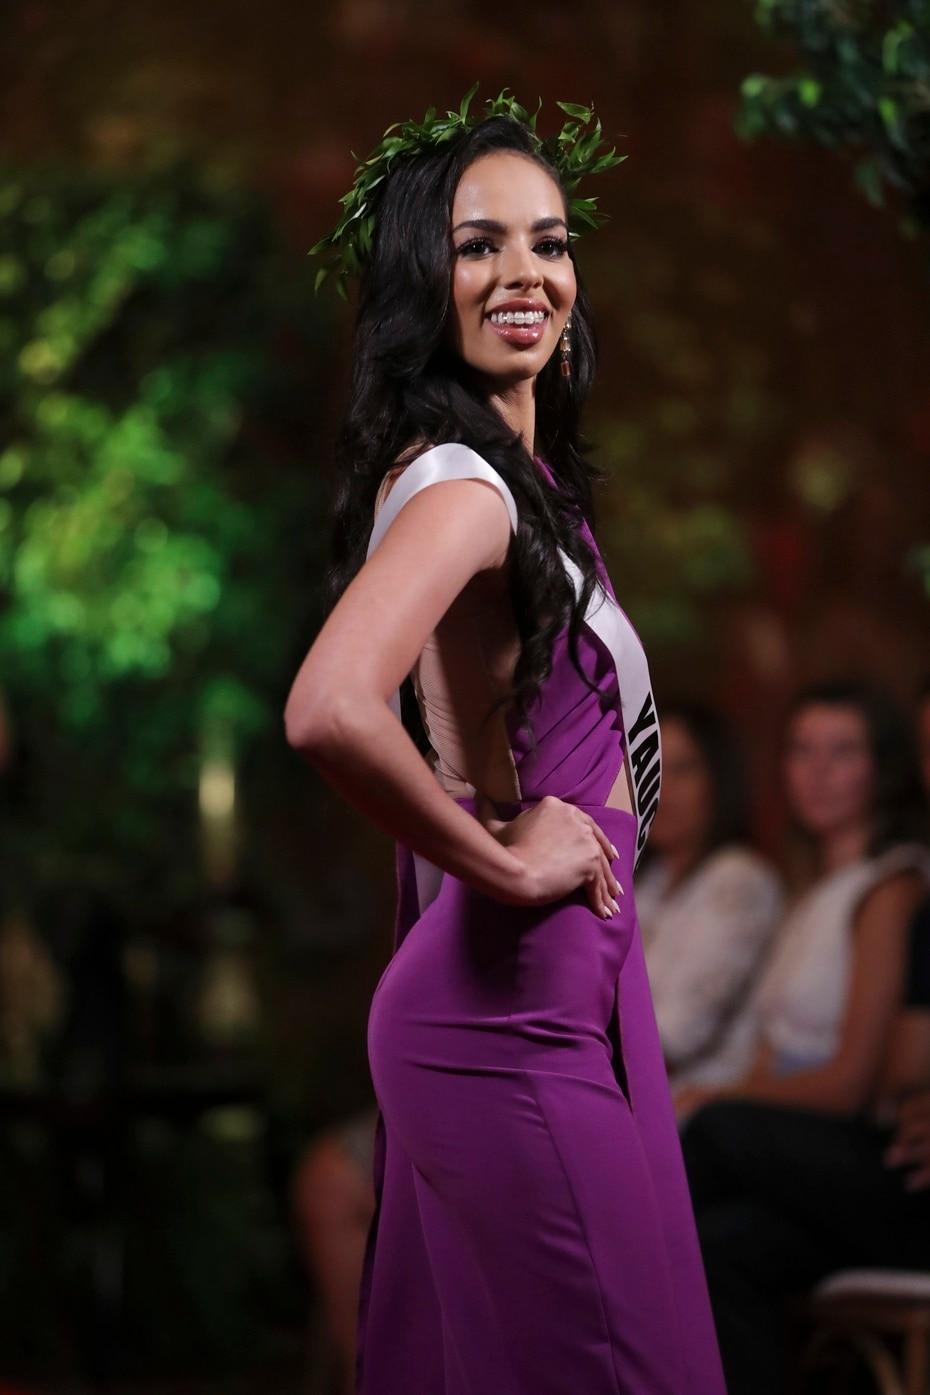 Andrea Cruz, Miss Yauco.